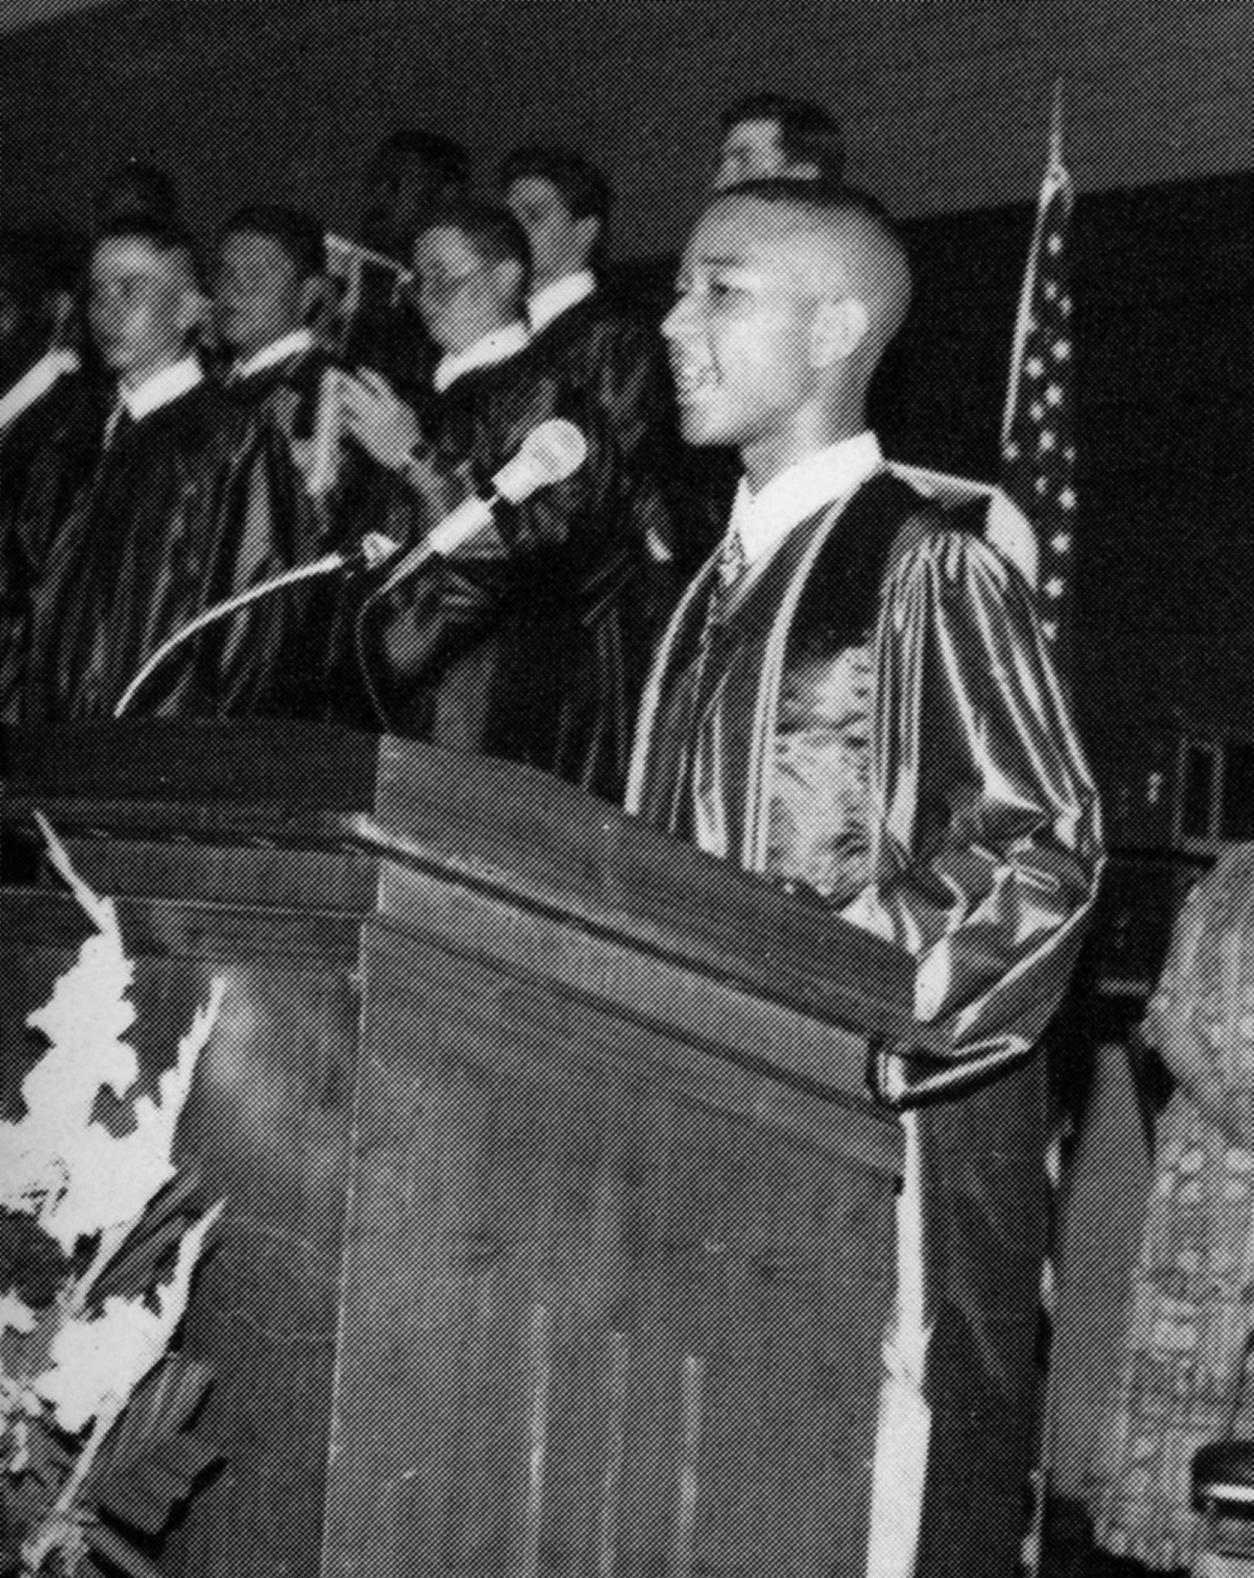 Image: John Legend in 1995